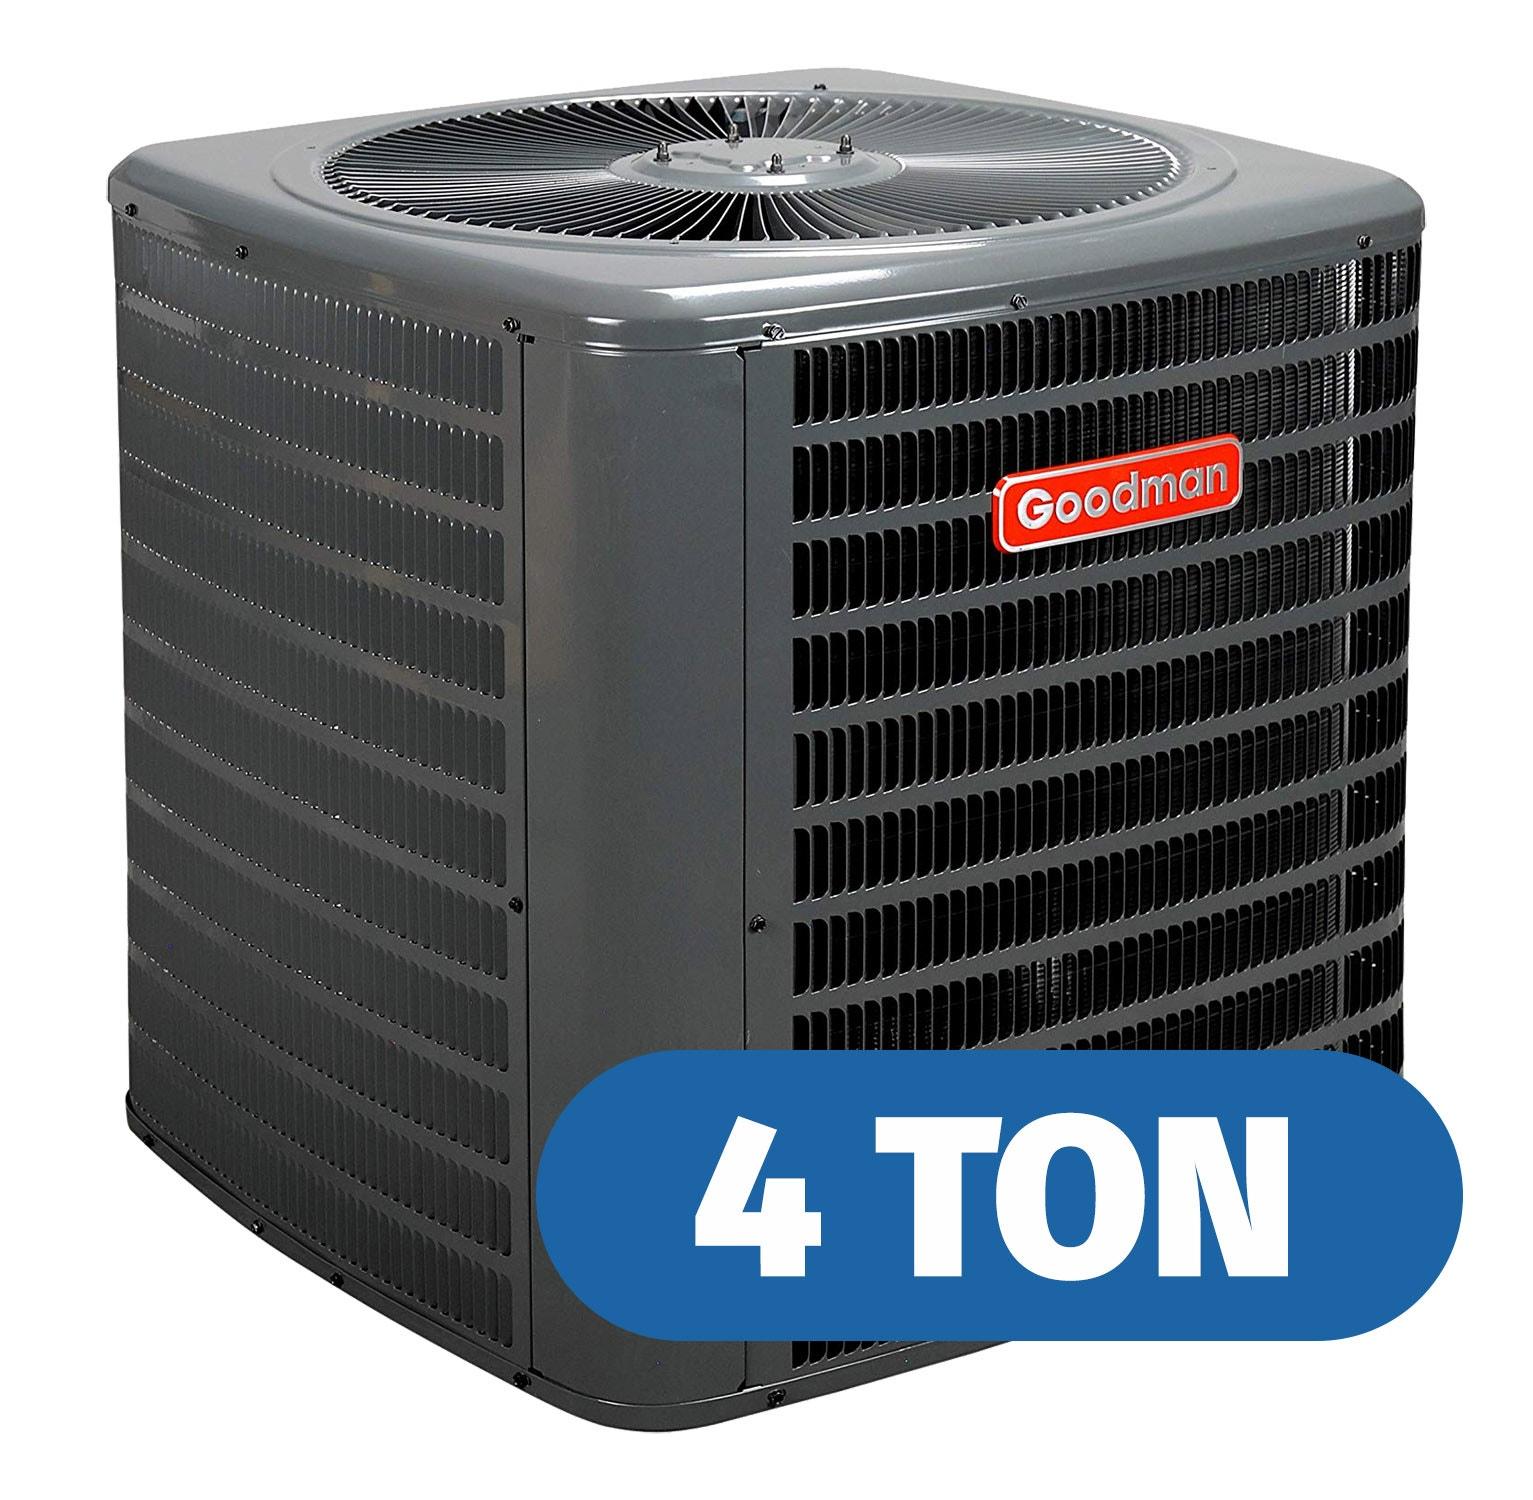 Goodman 4 Ton Heat Pumps